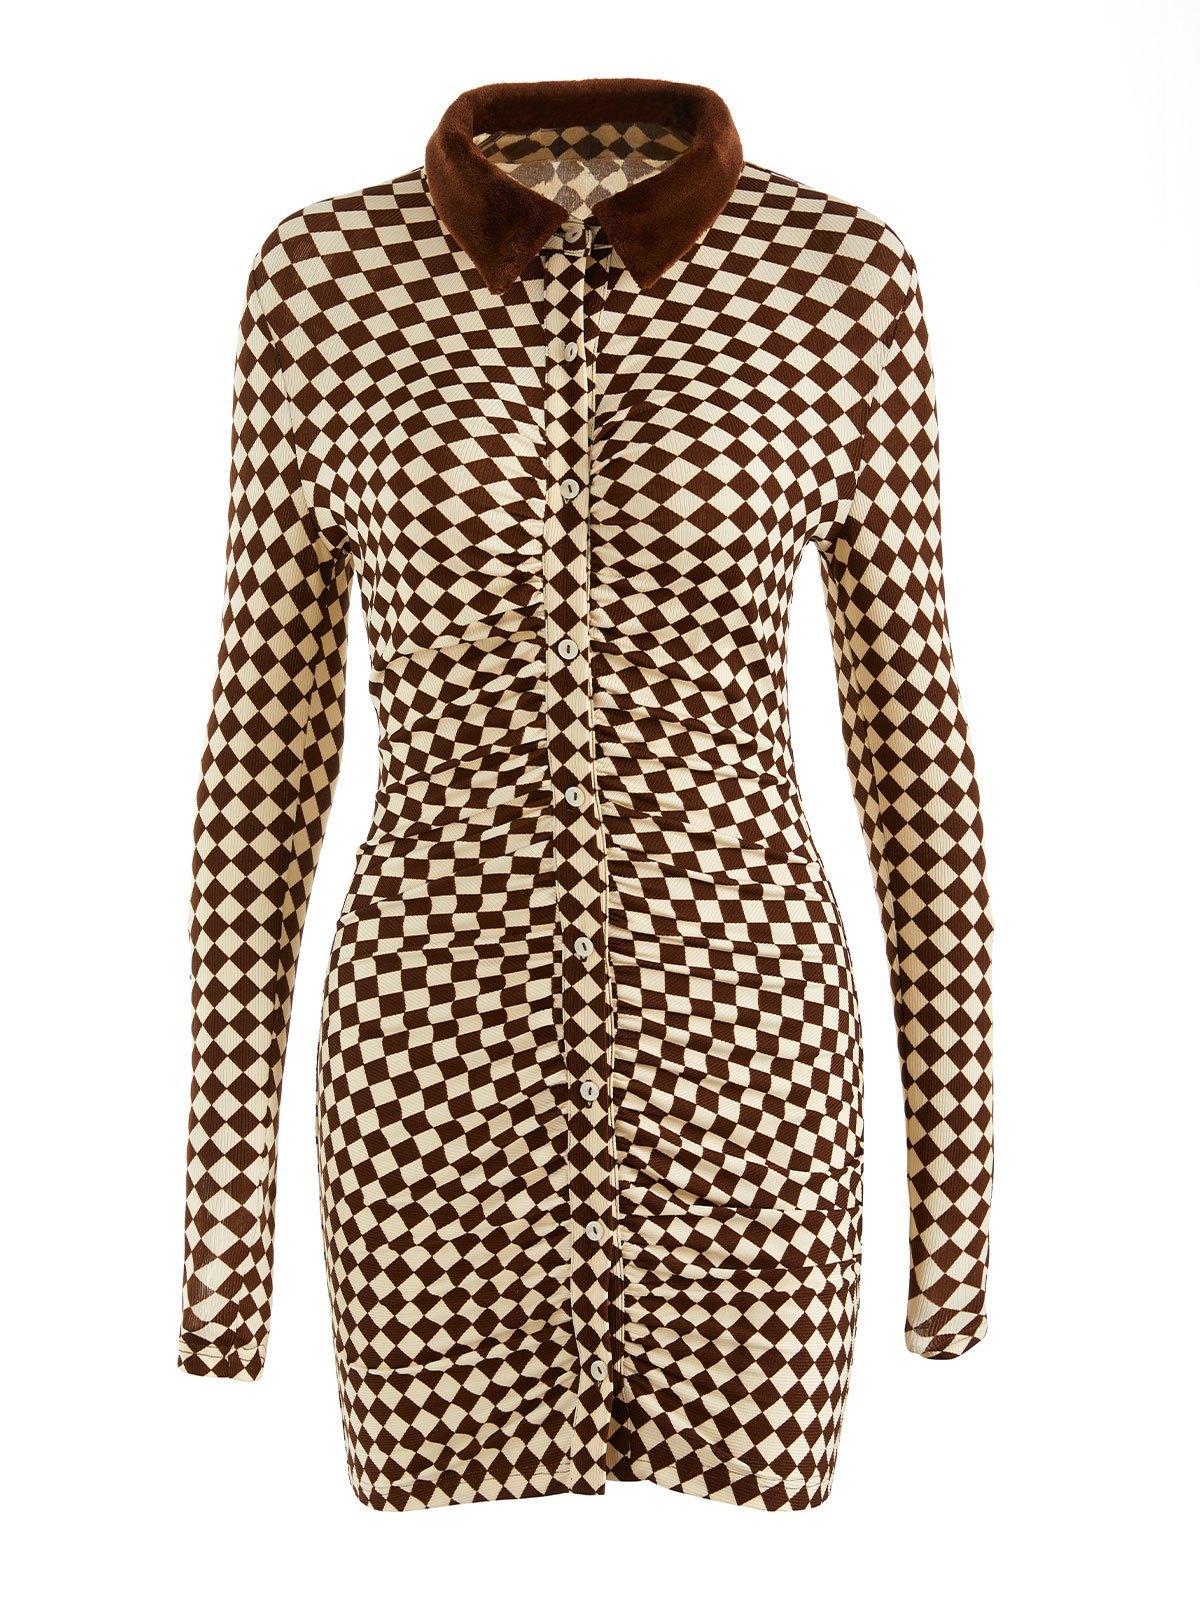 EMMIOL Polo Neck Checkered Long Sleeve Midi Dress - Brown L